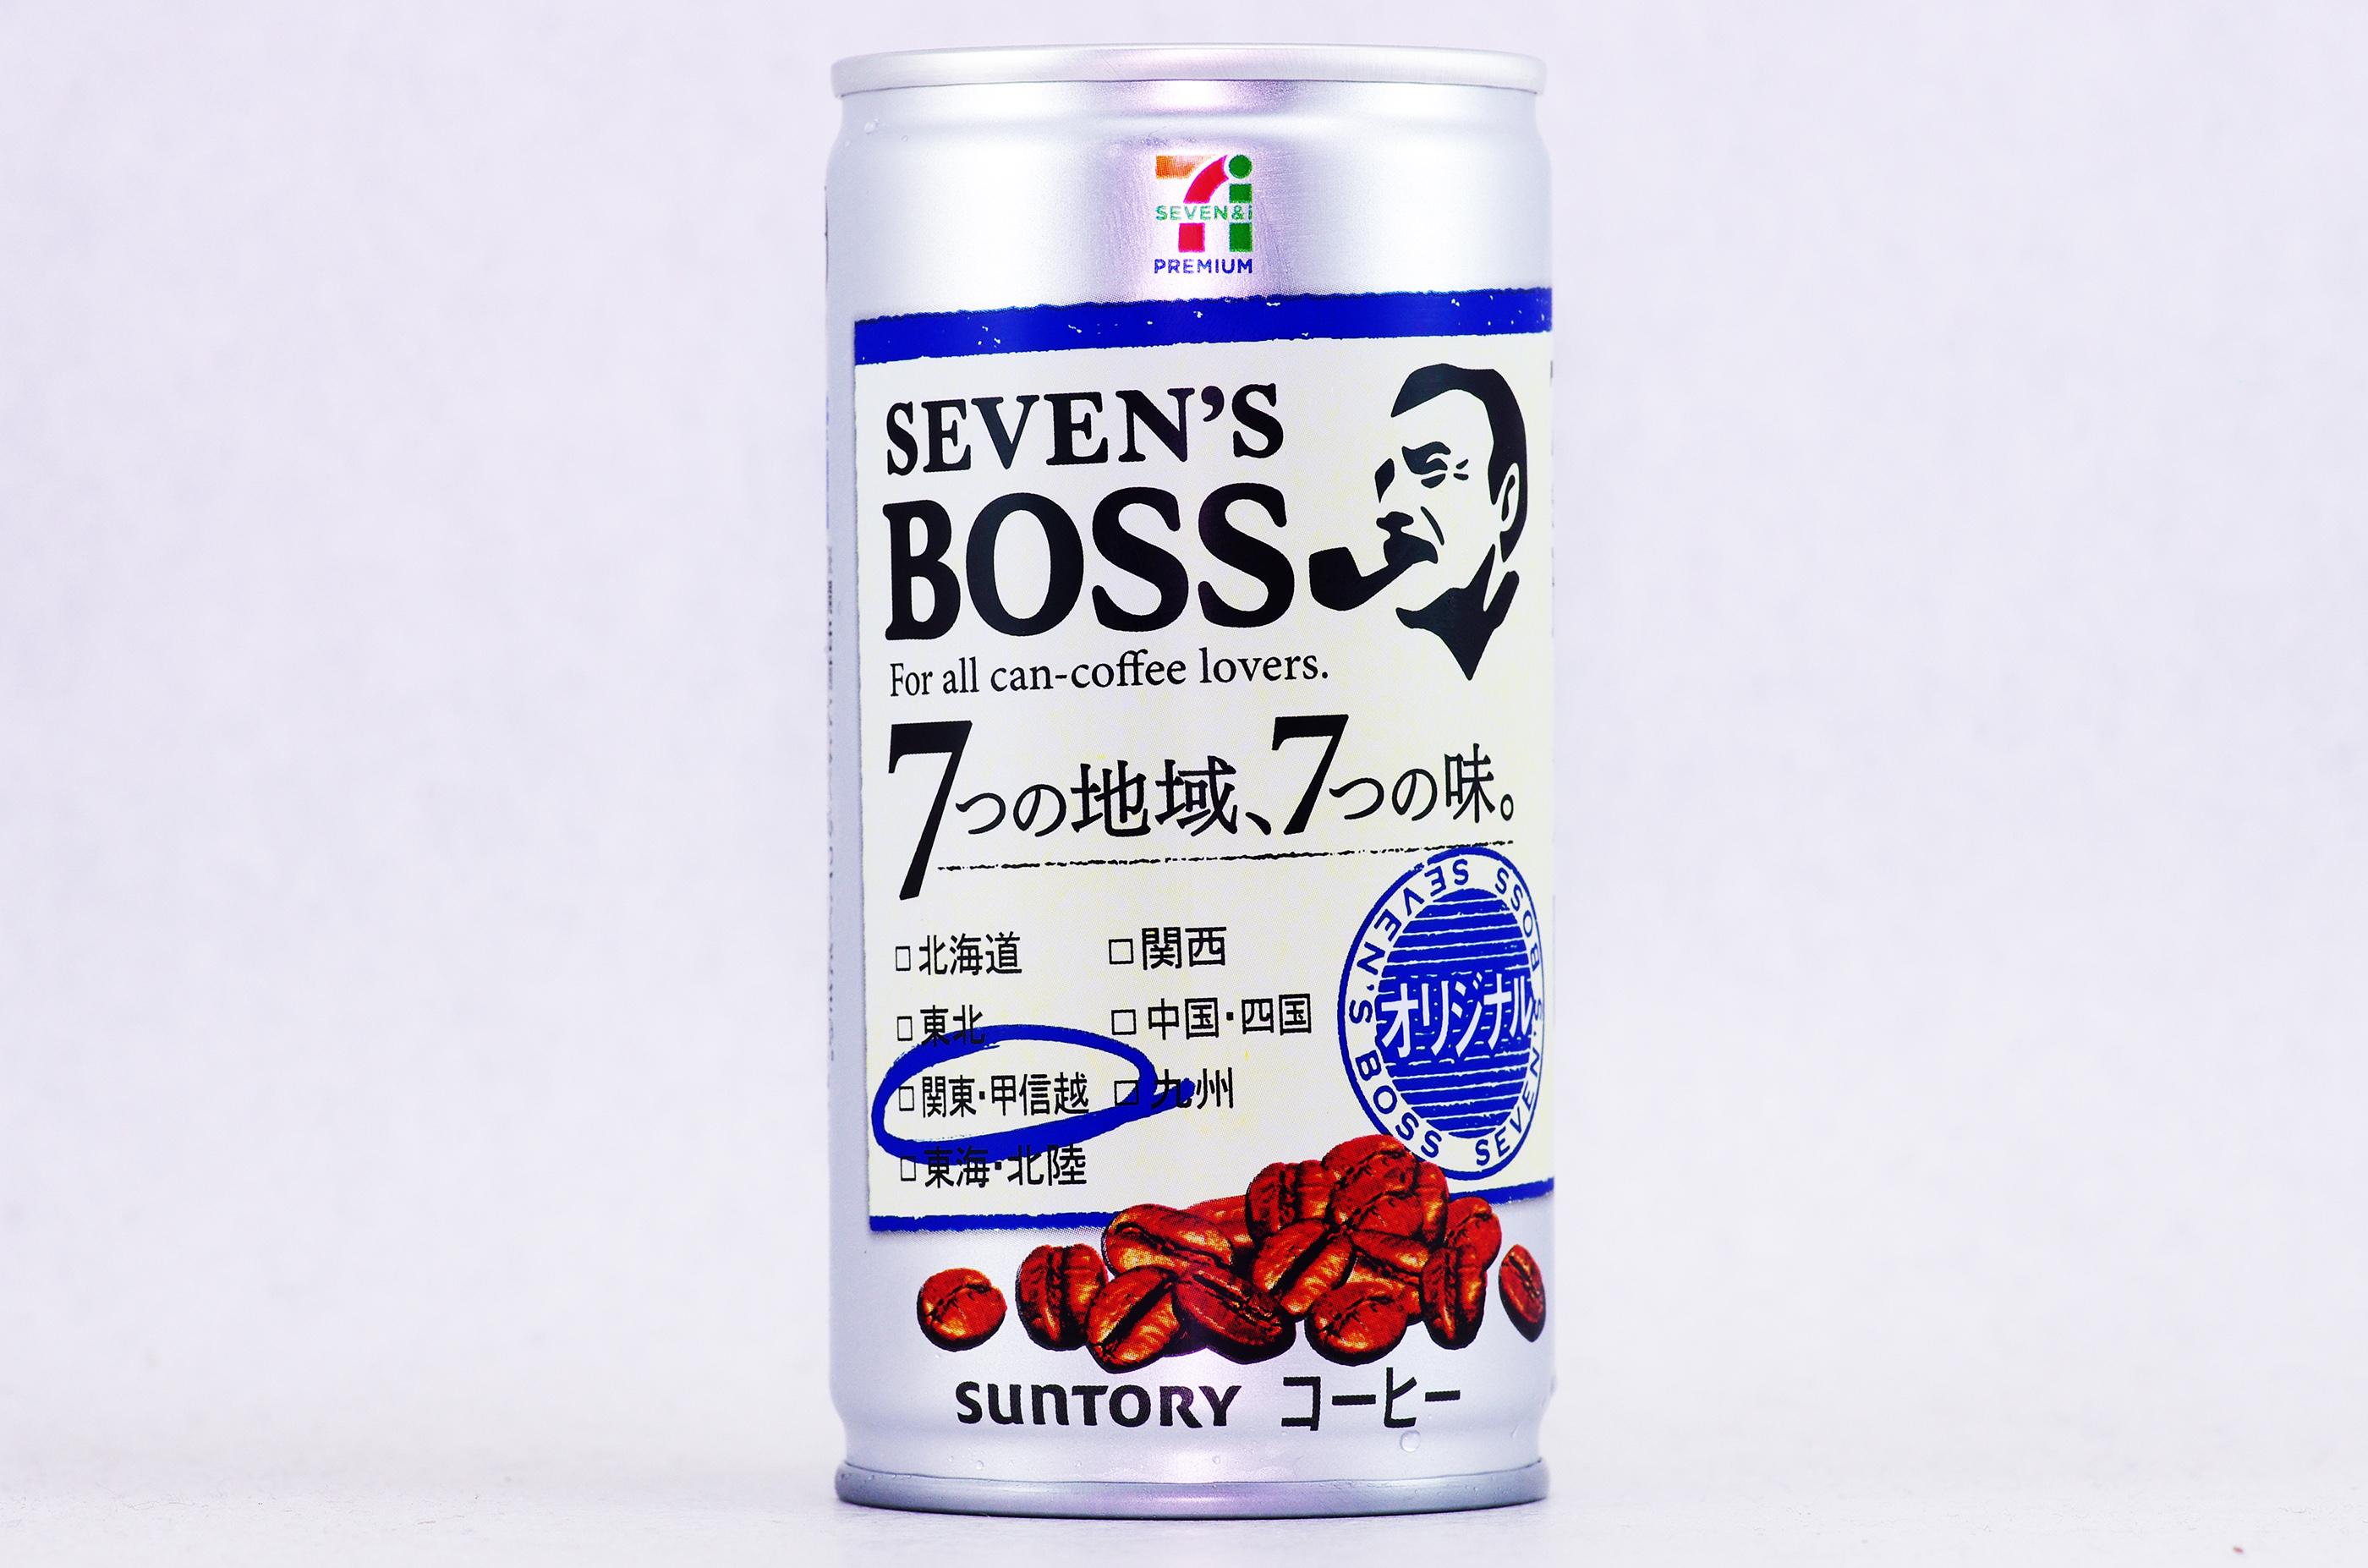 SEVEN'S BOSS オリジナル 関東・甲信越限定 前回登録品